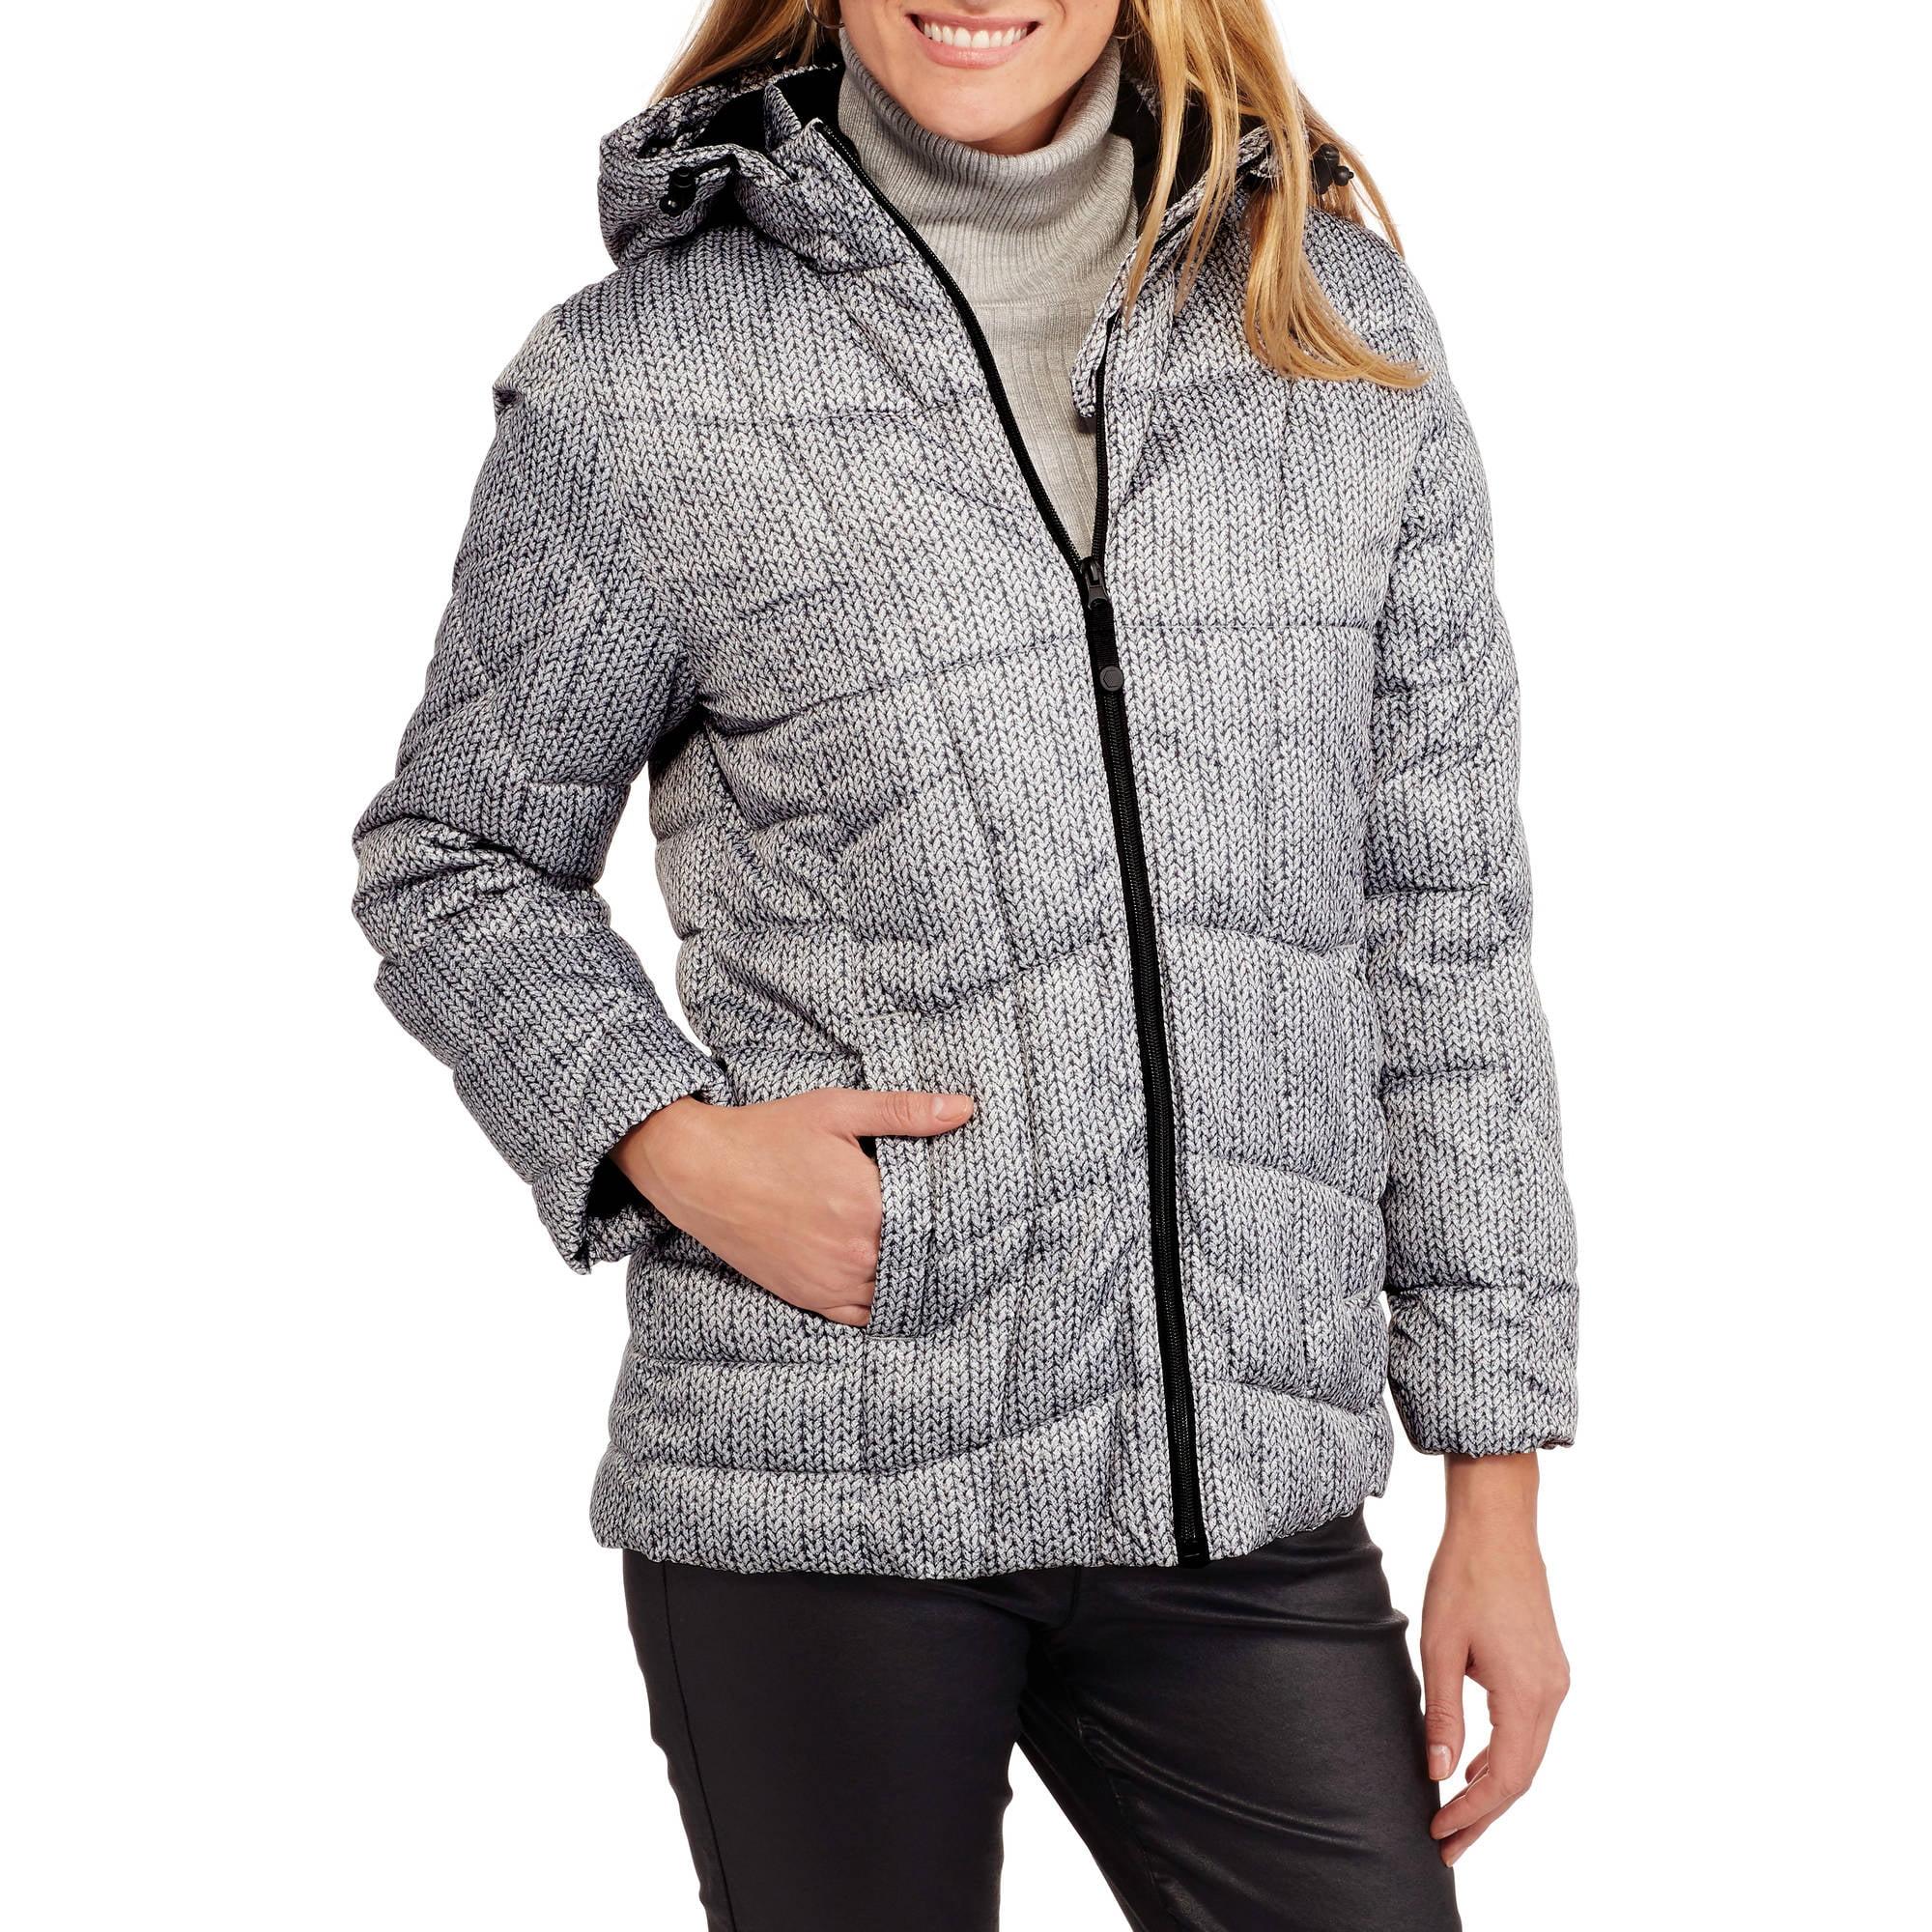 Faded Glory Women's Hooded Puffer Jacket Coat - Walmart.com